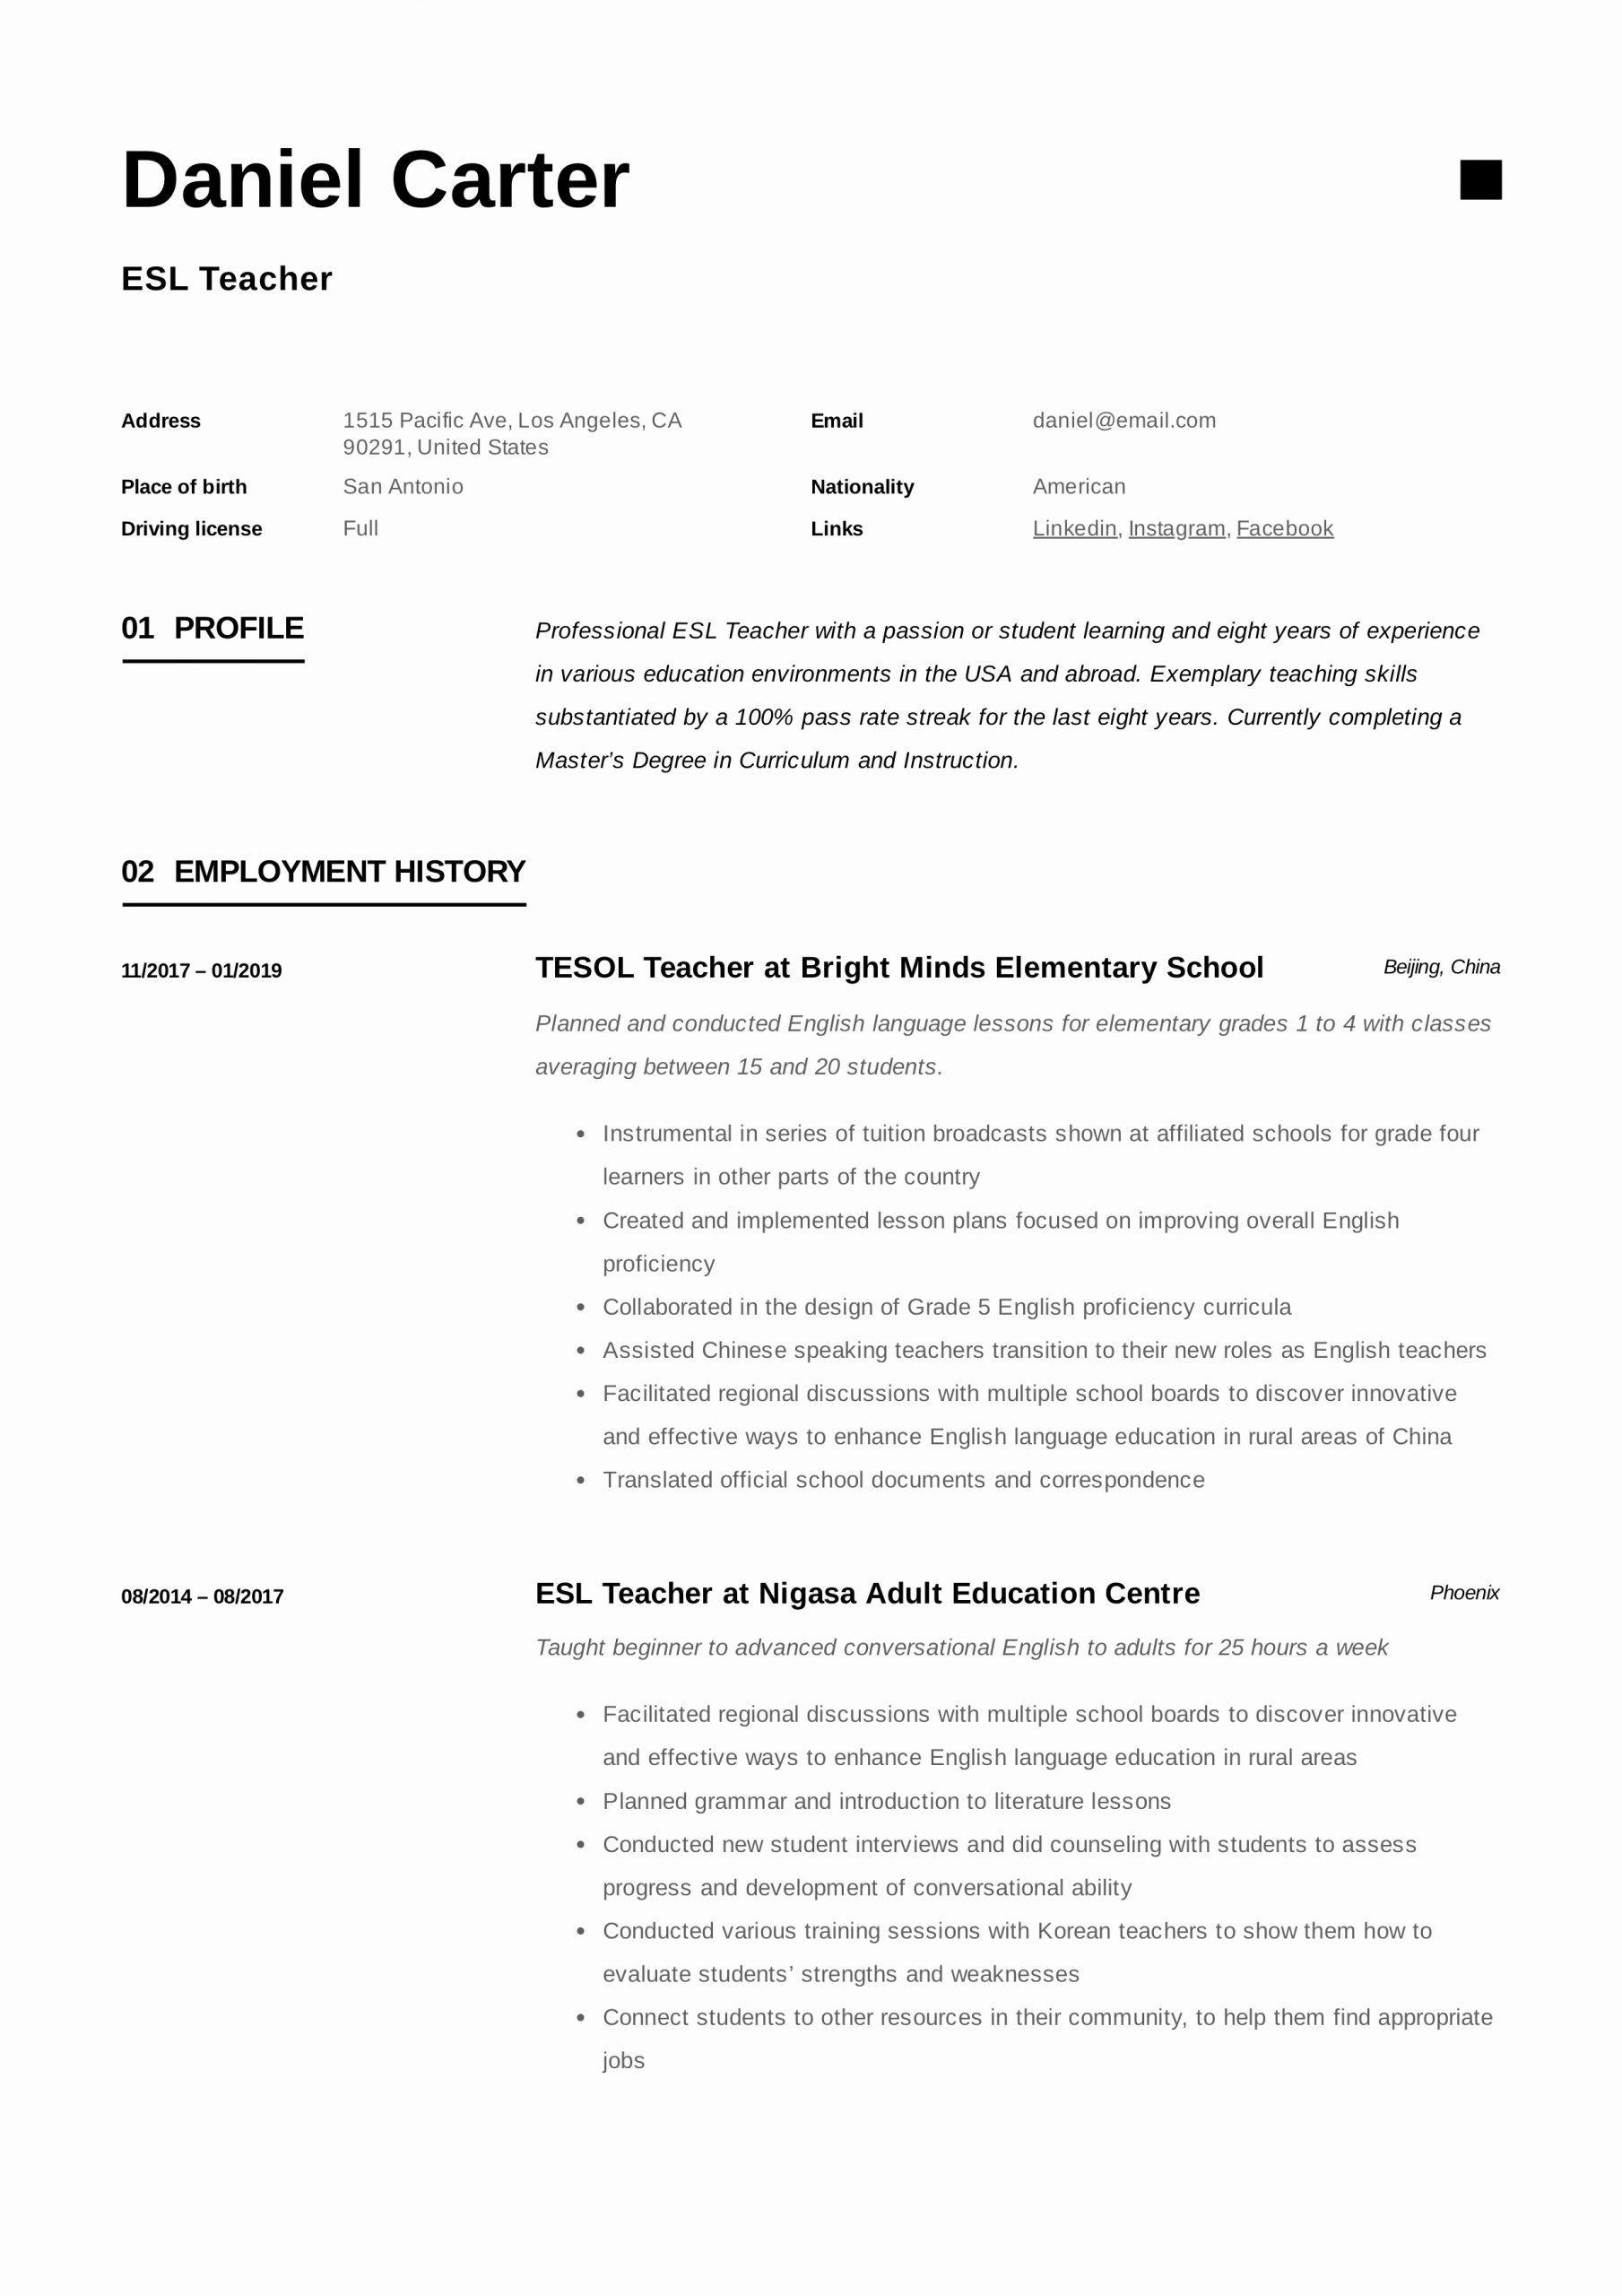 Esl Teacher Job Description Resume Inspirational Esl